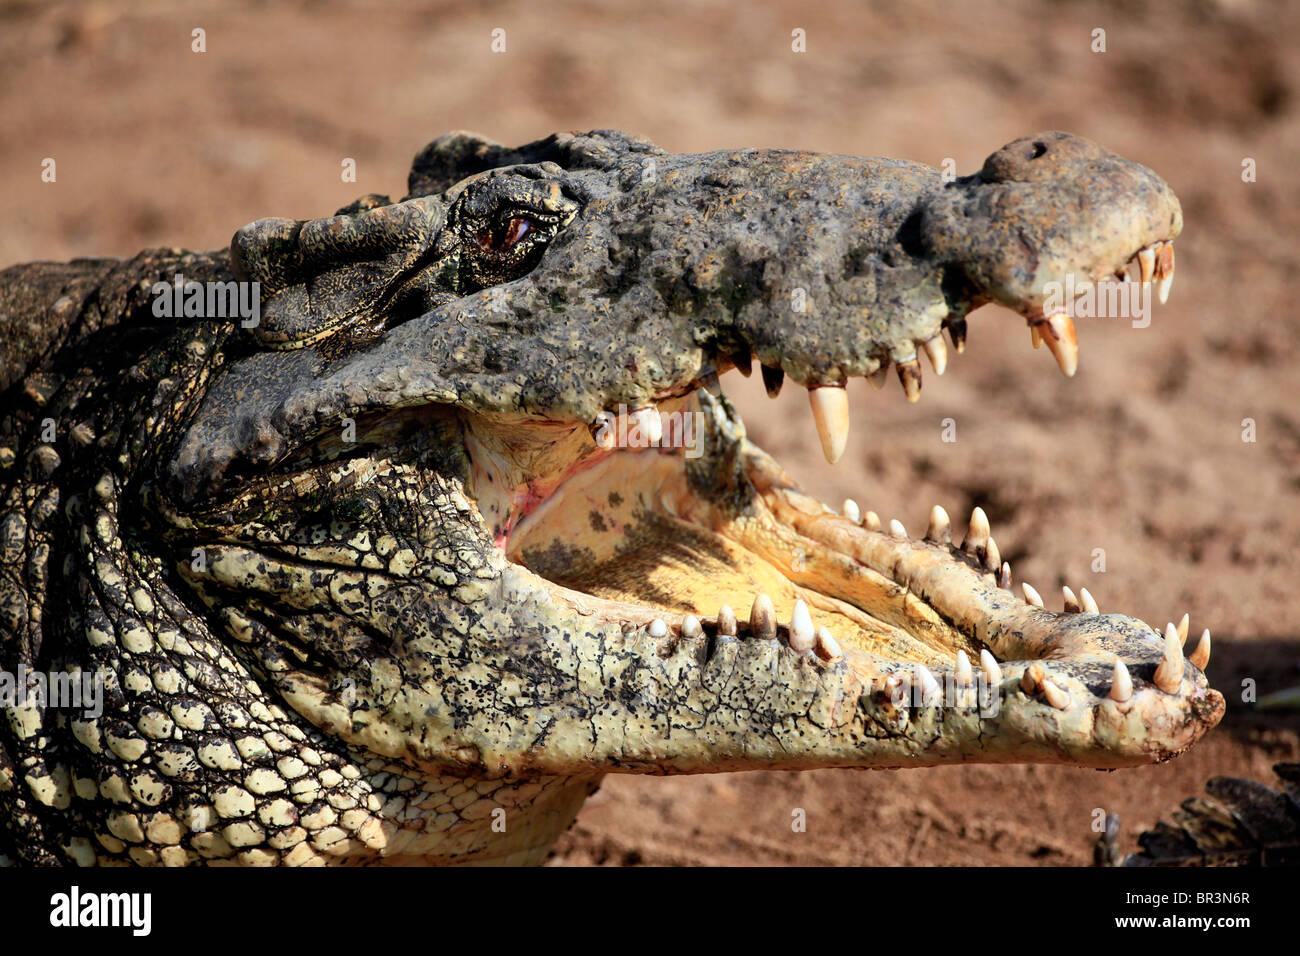 Cuban Crocodile - Stock Image